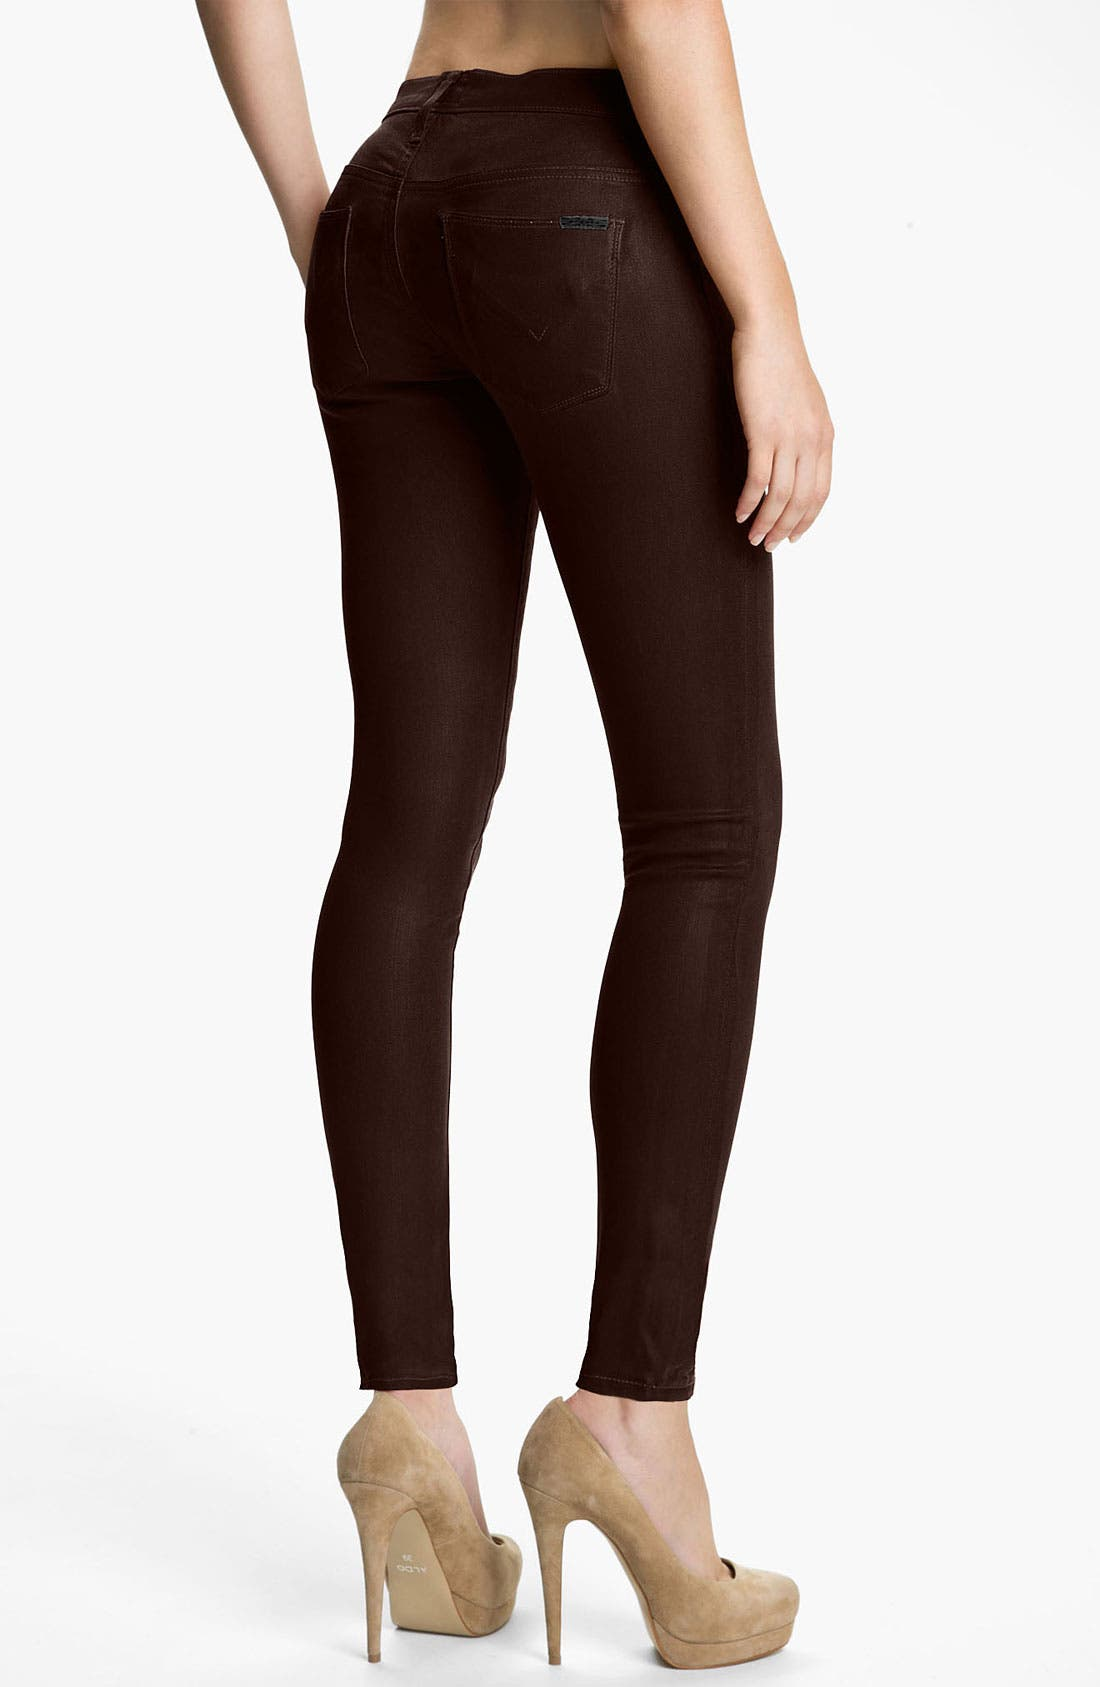 Alternate Image 2  - Hudson Jeans 'Krista' Super Skinny Jeans (Stout Wax)